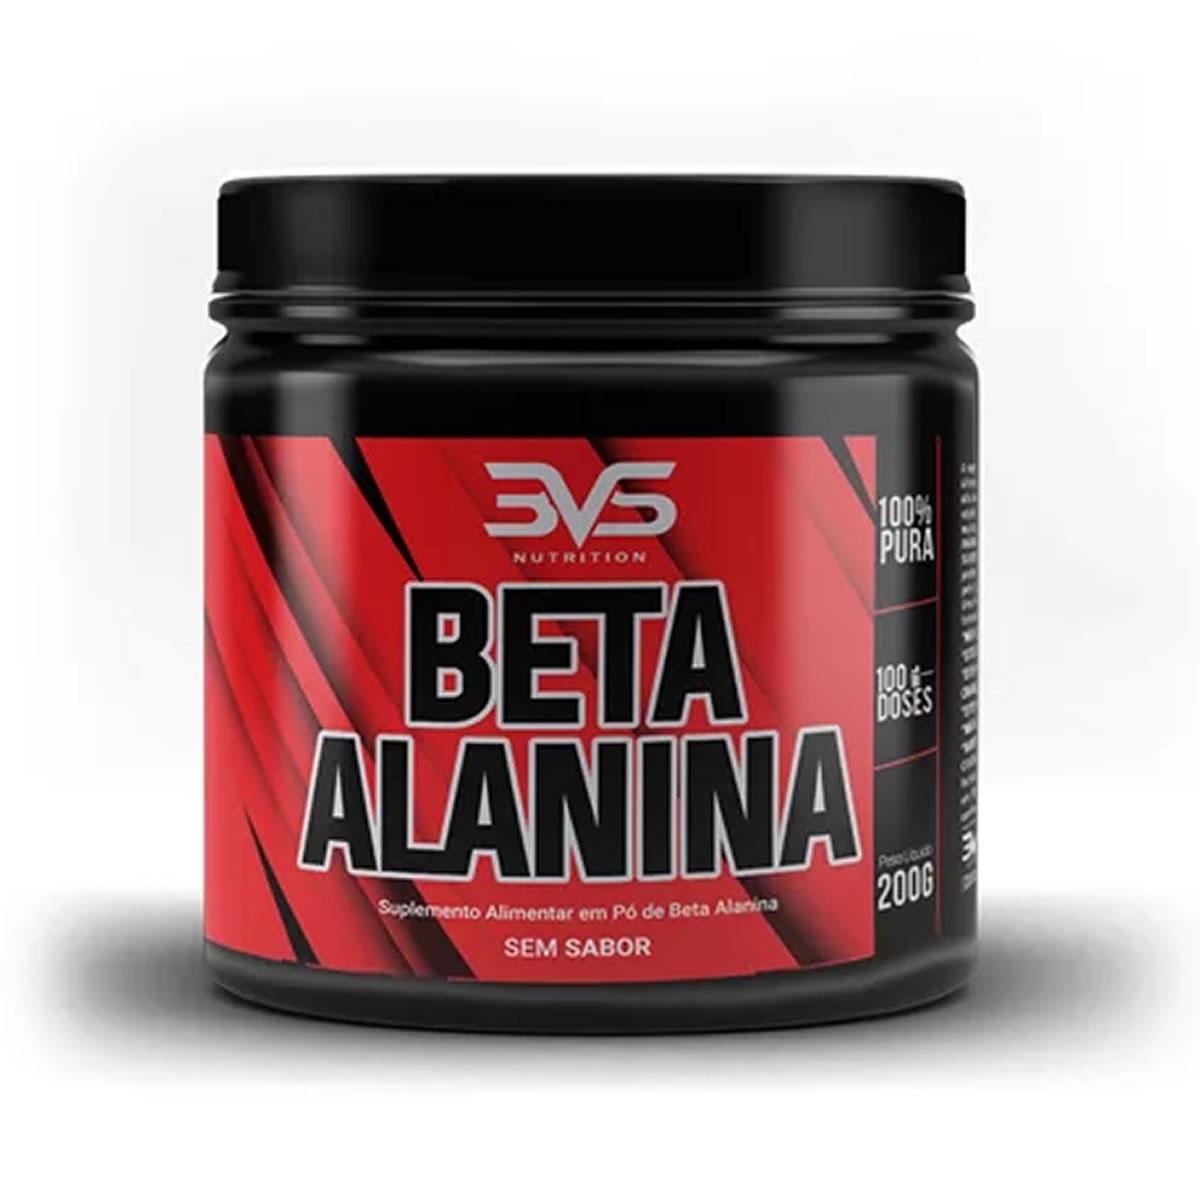 Beta Alanina 200g - FTW